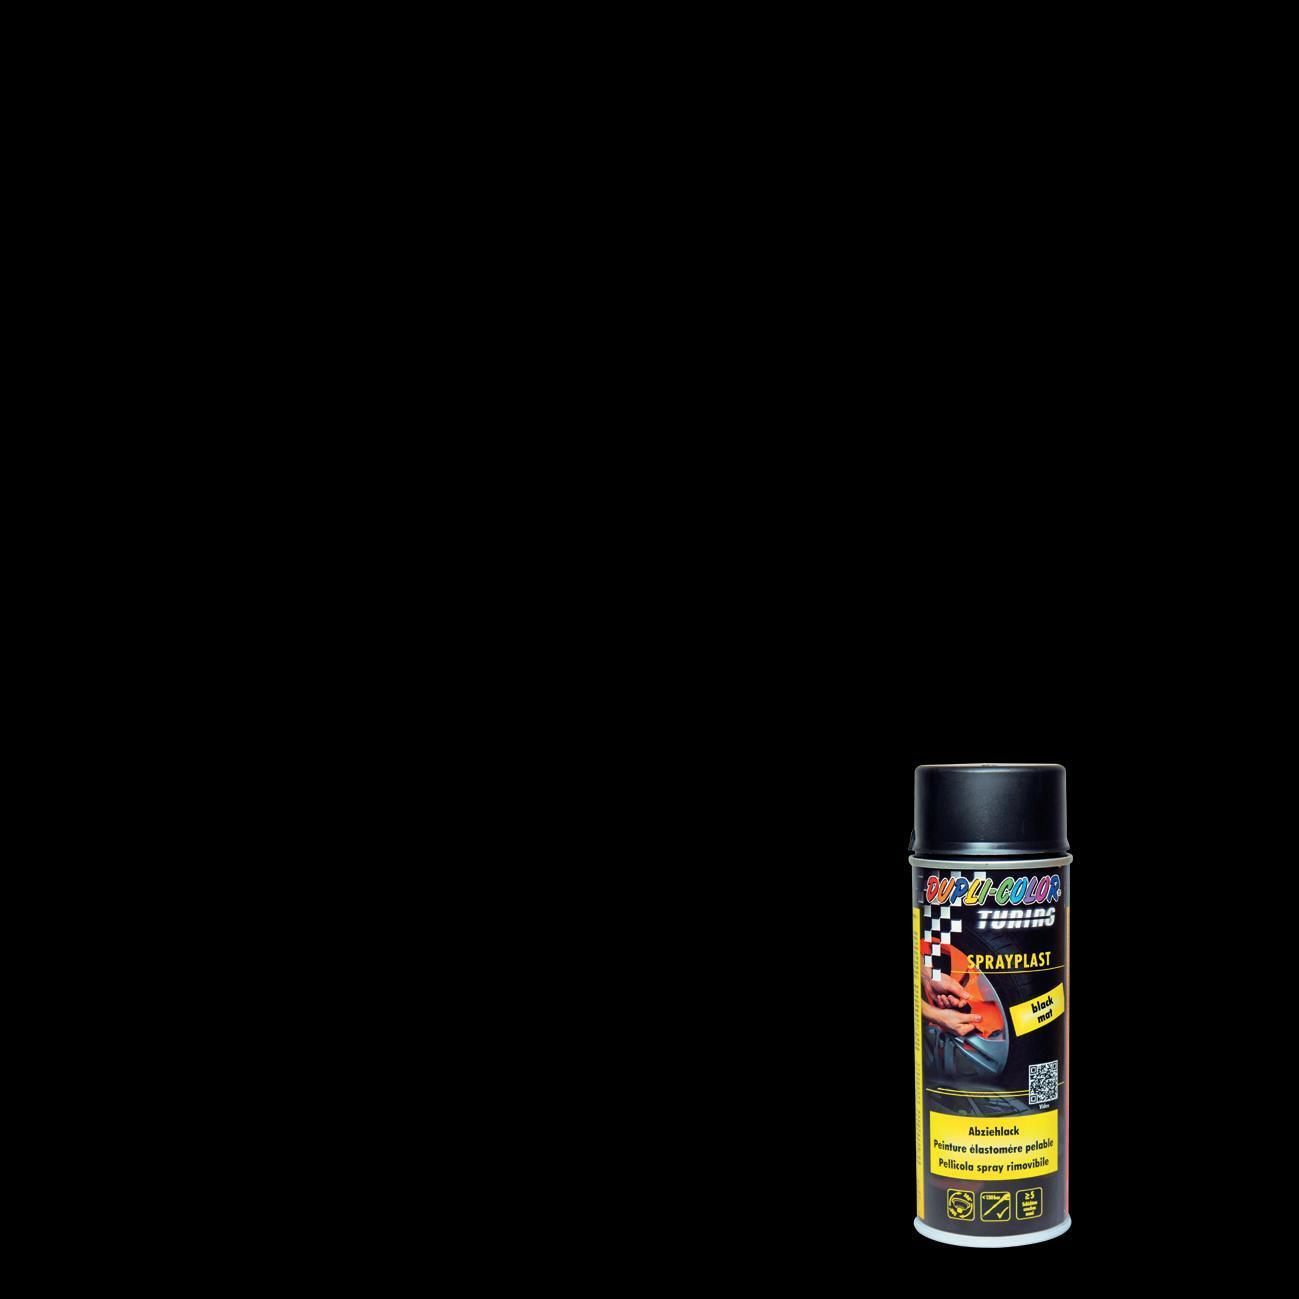 Smalto spray base solvente DUPLI COLOR Sprayplast 0.0075 L nero opaco - 1